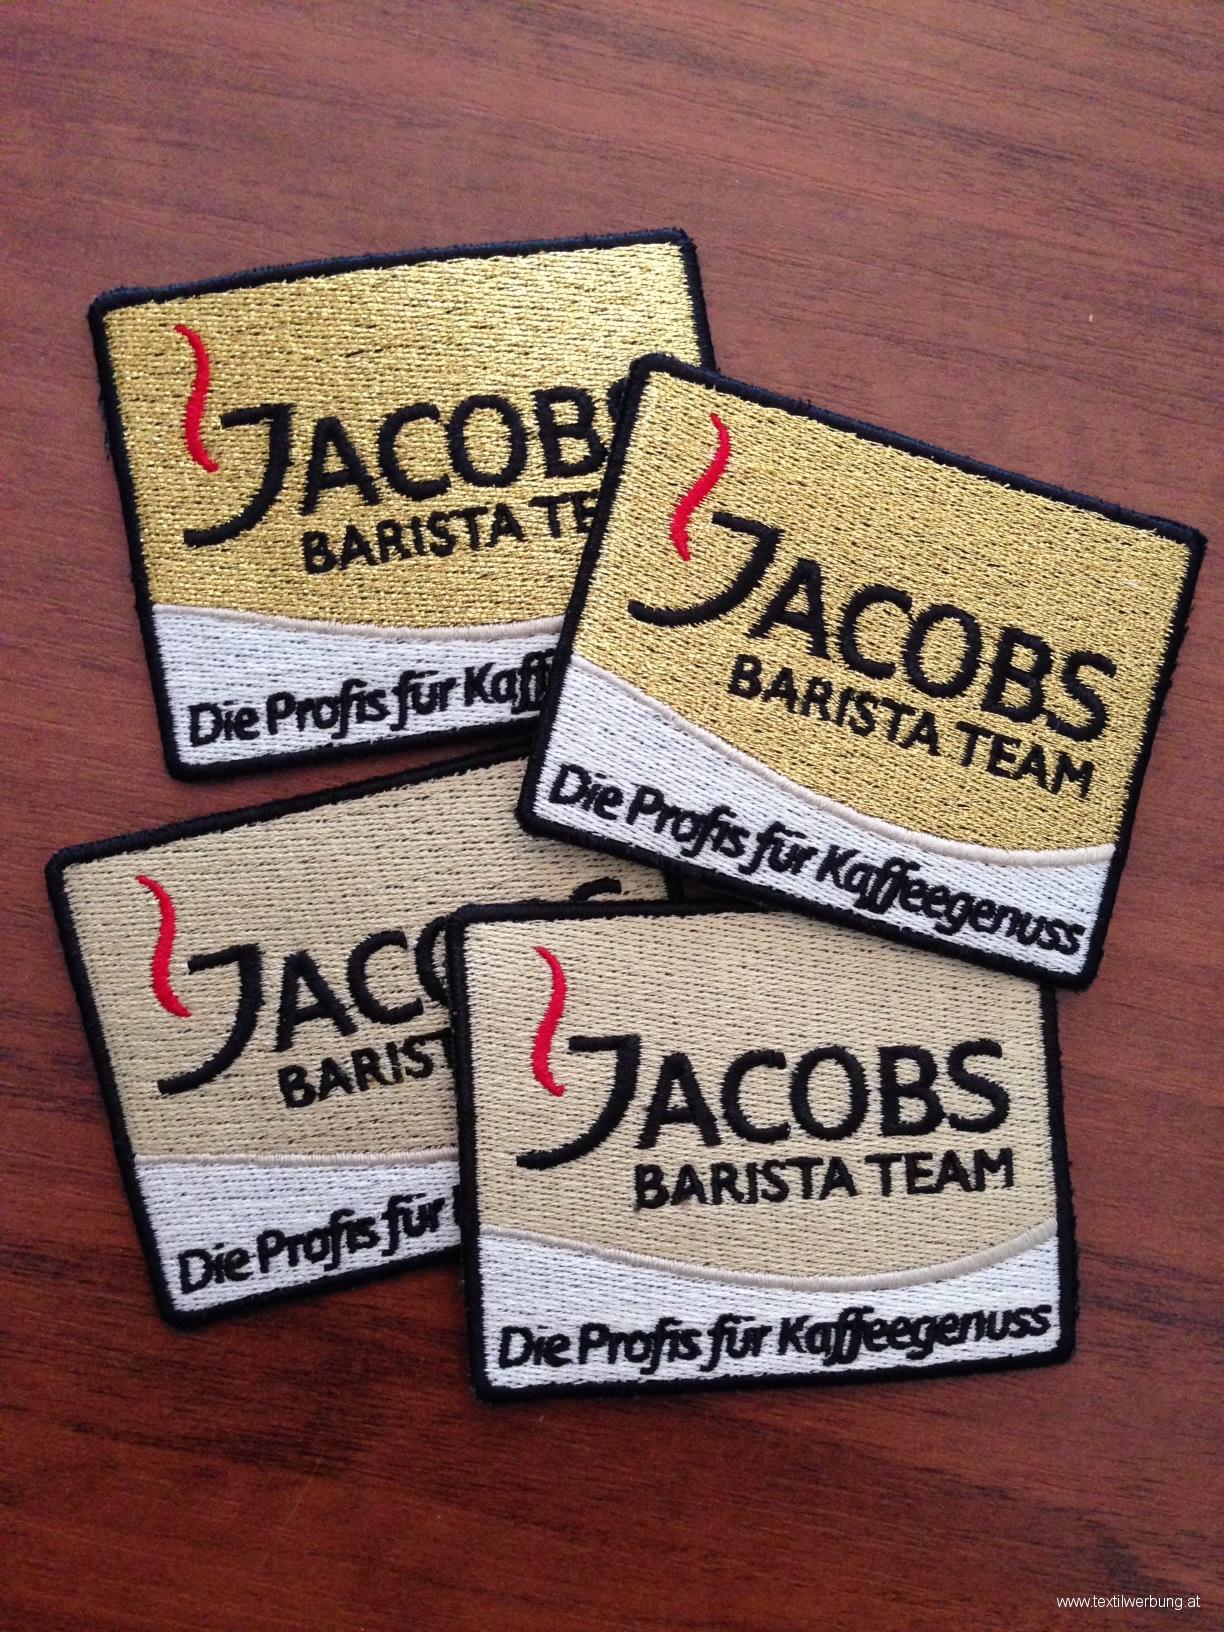 jacobs-barista